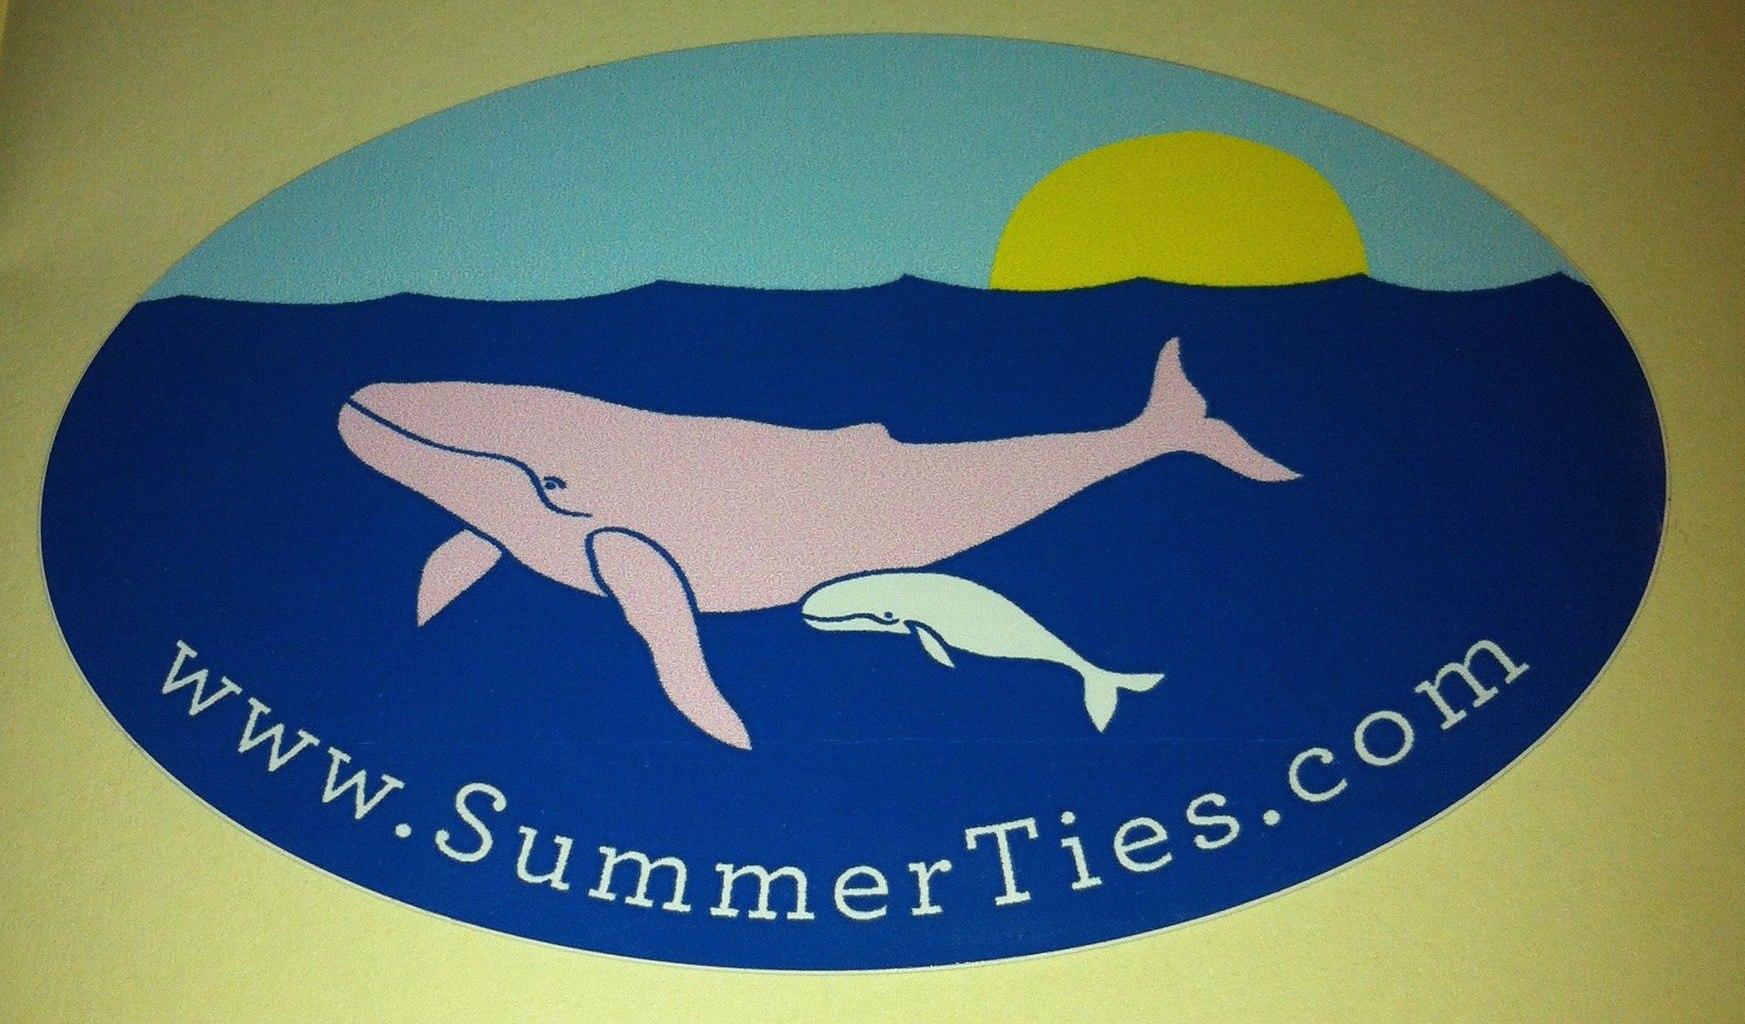 whale summer ties